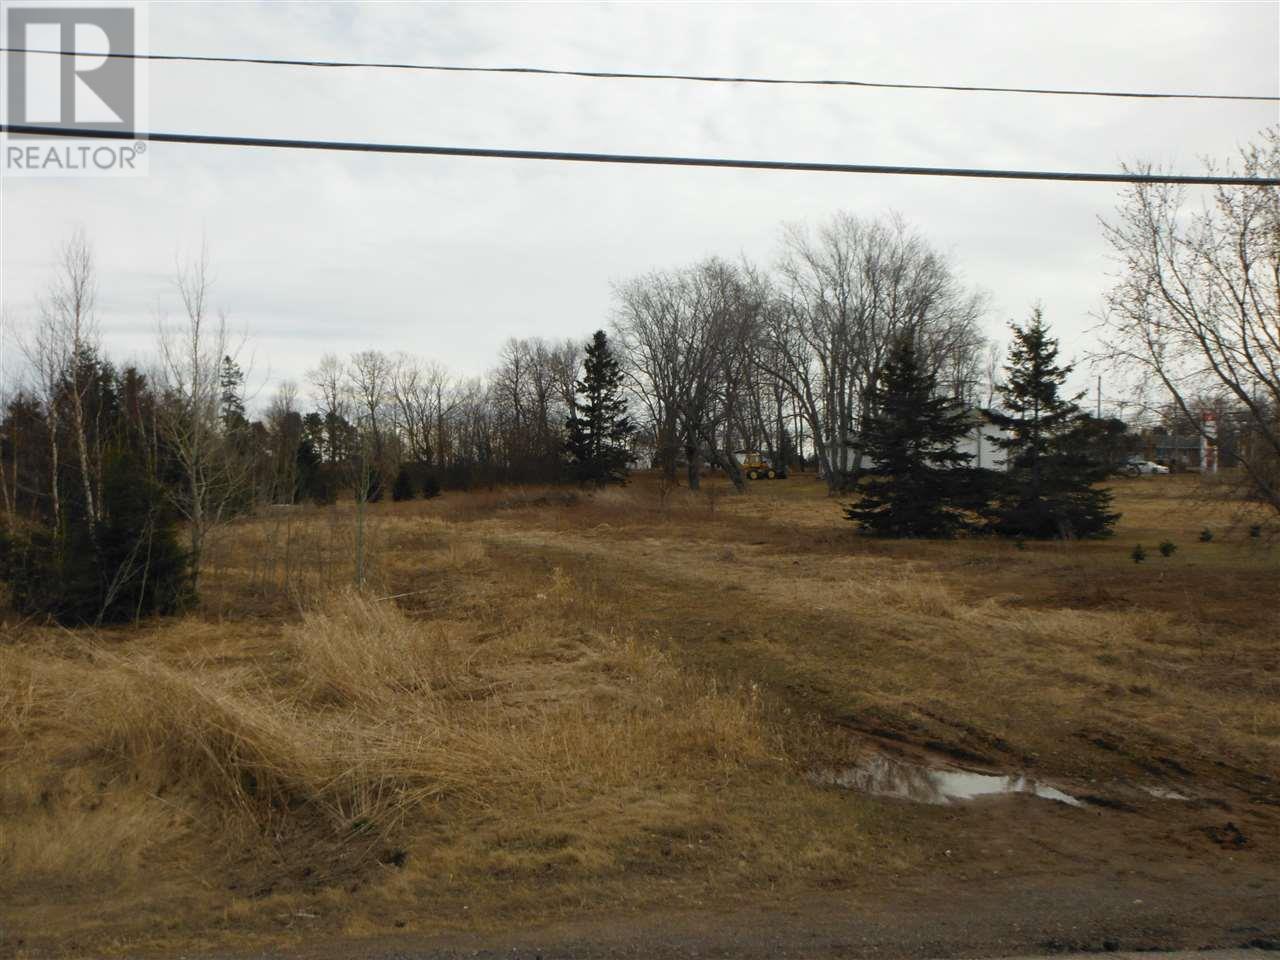 Lot 1-16 Royalty Junction Road, Charlottetown, Prince Edward Island  C1E 1Z2 - Photo 2 - 202006111